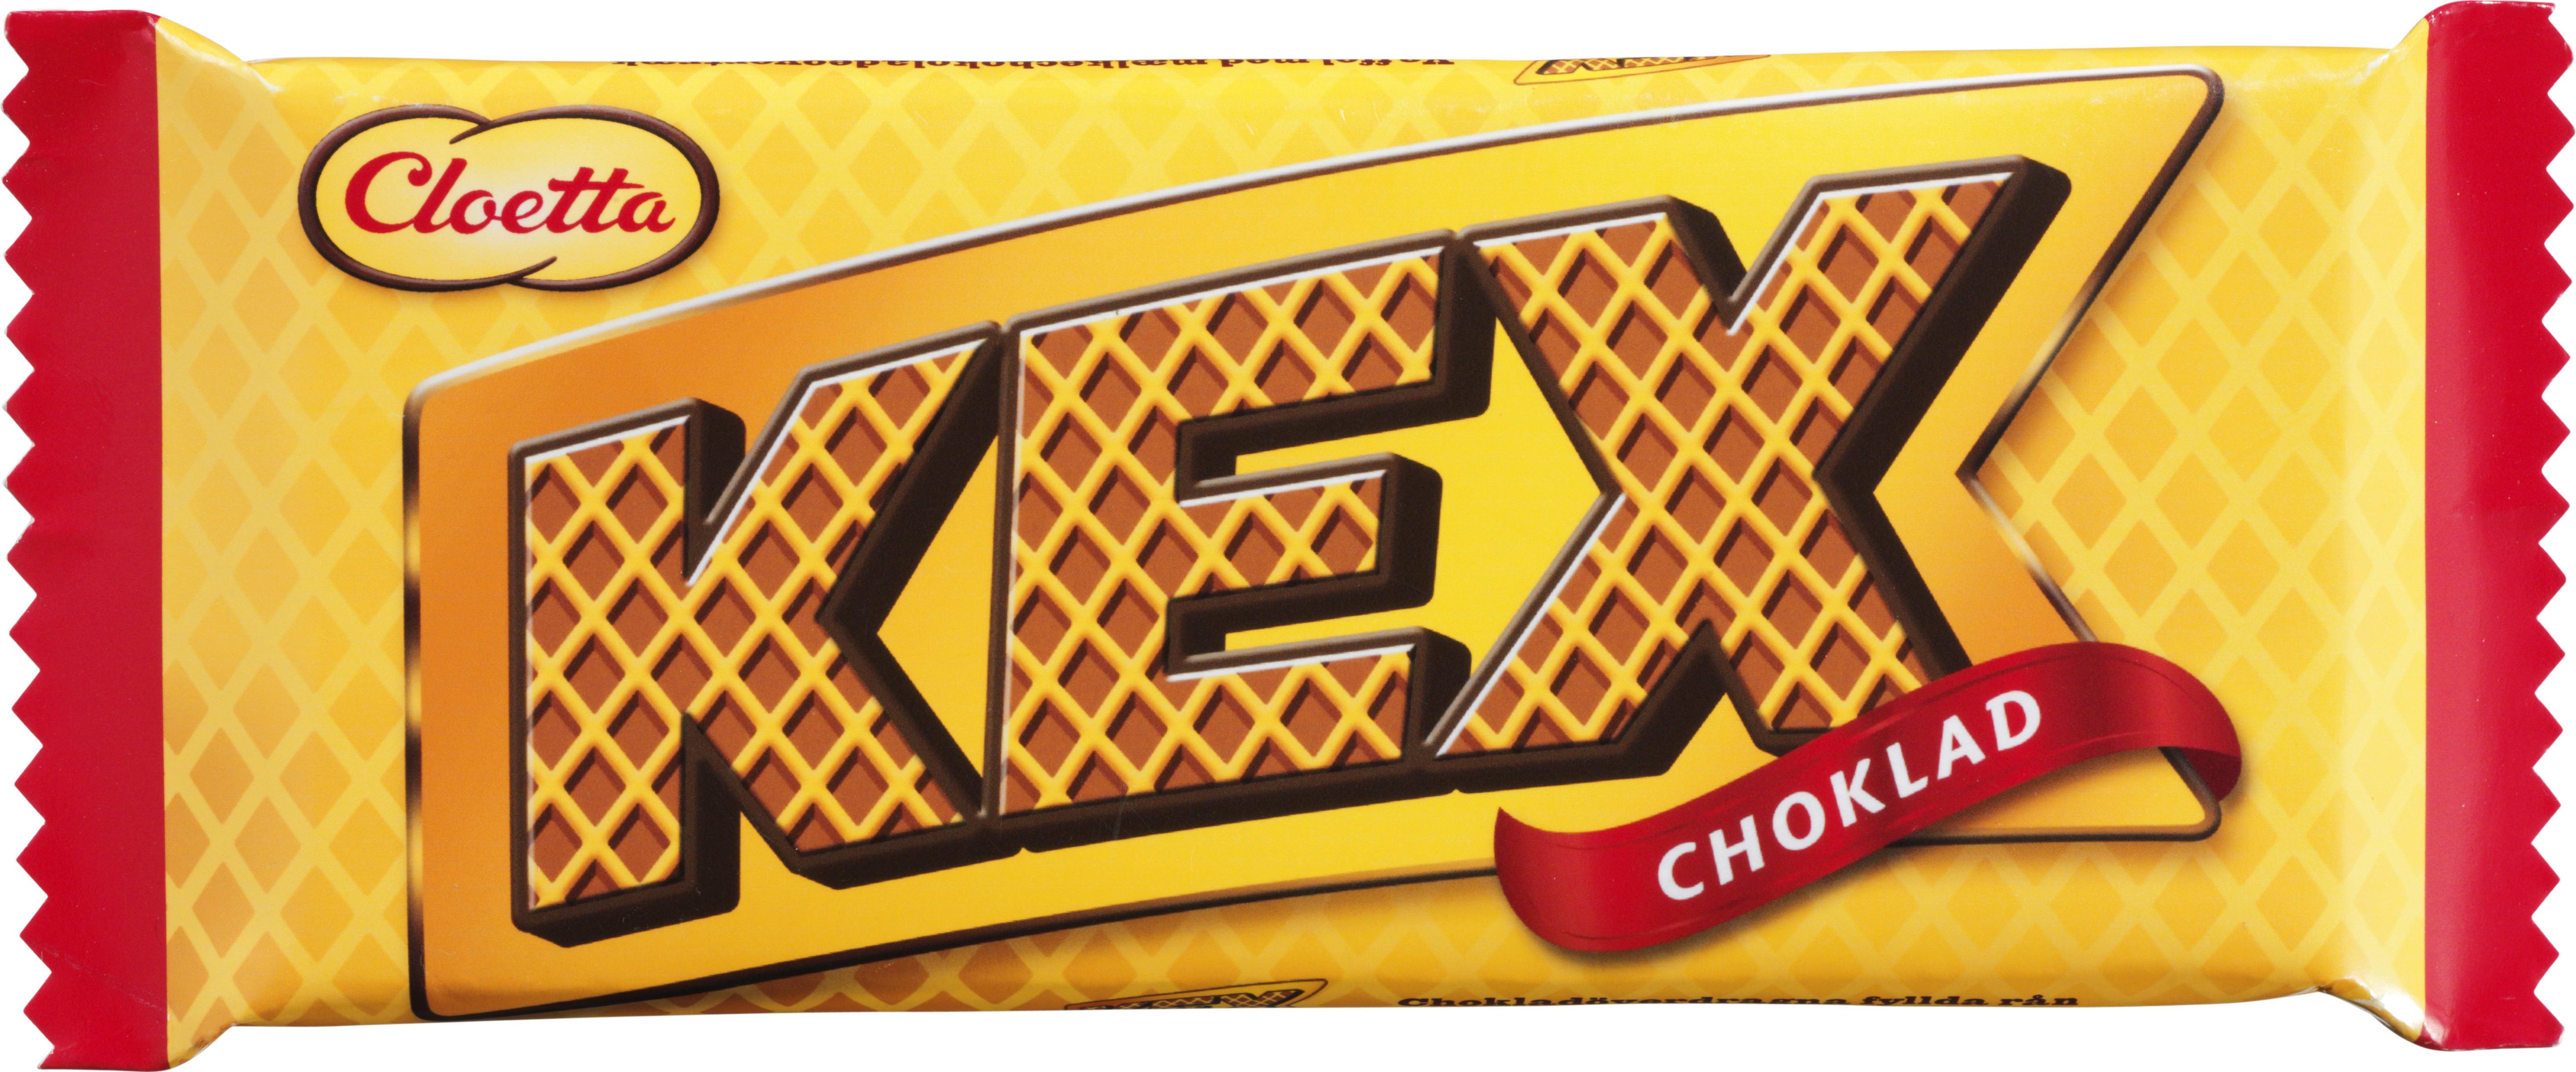 kexchoklad pris ica